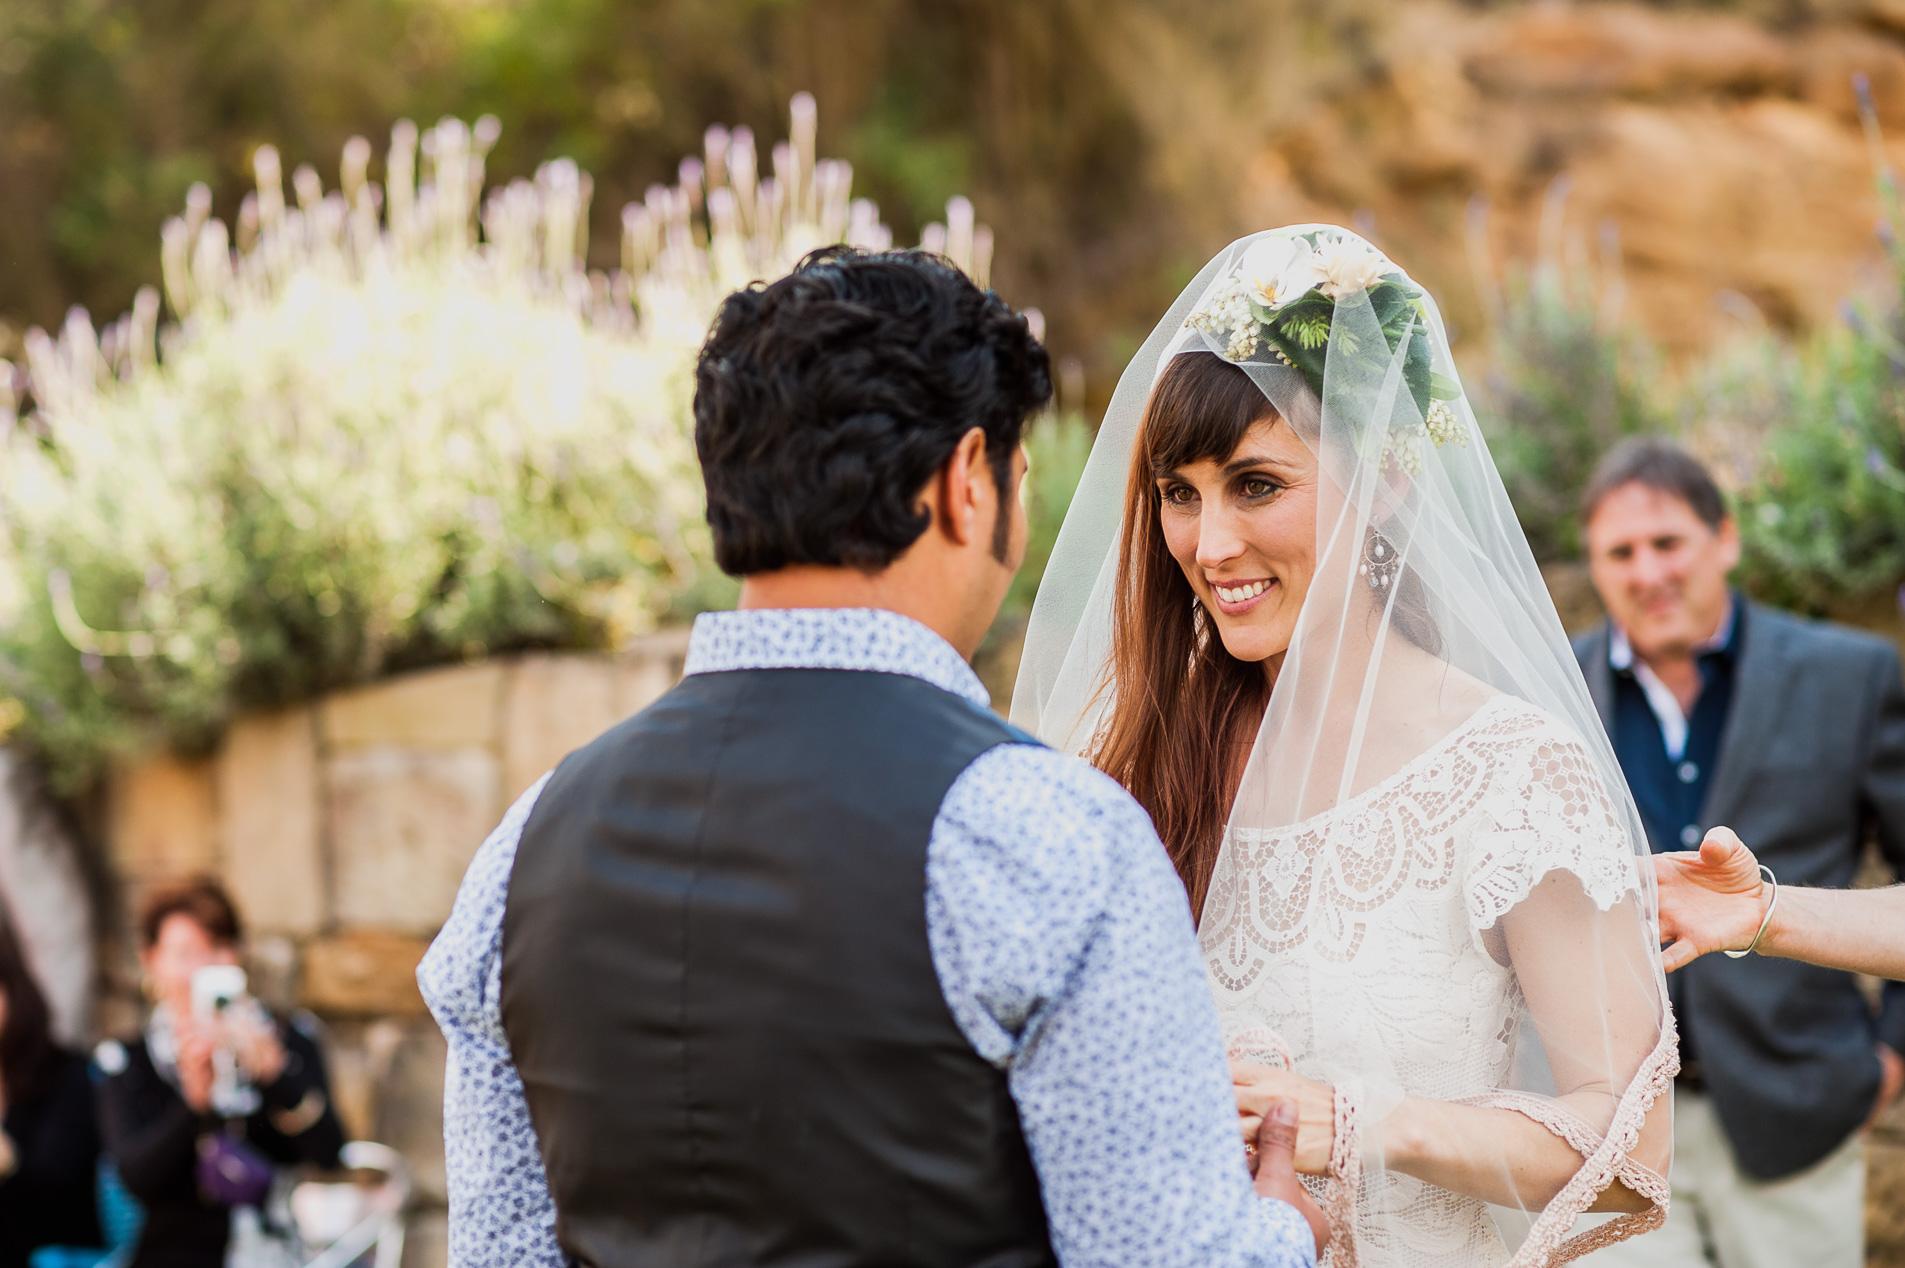 Rachel-gonzalo-wedding-sydney-27